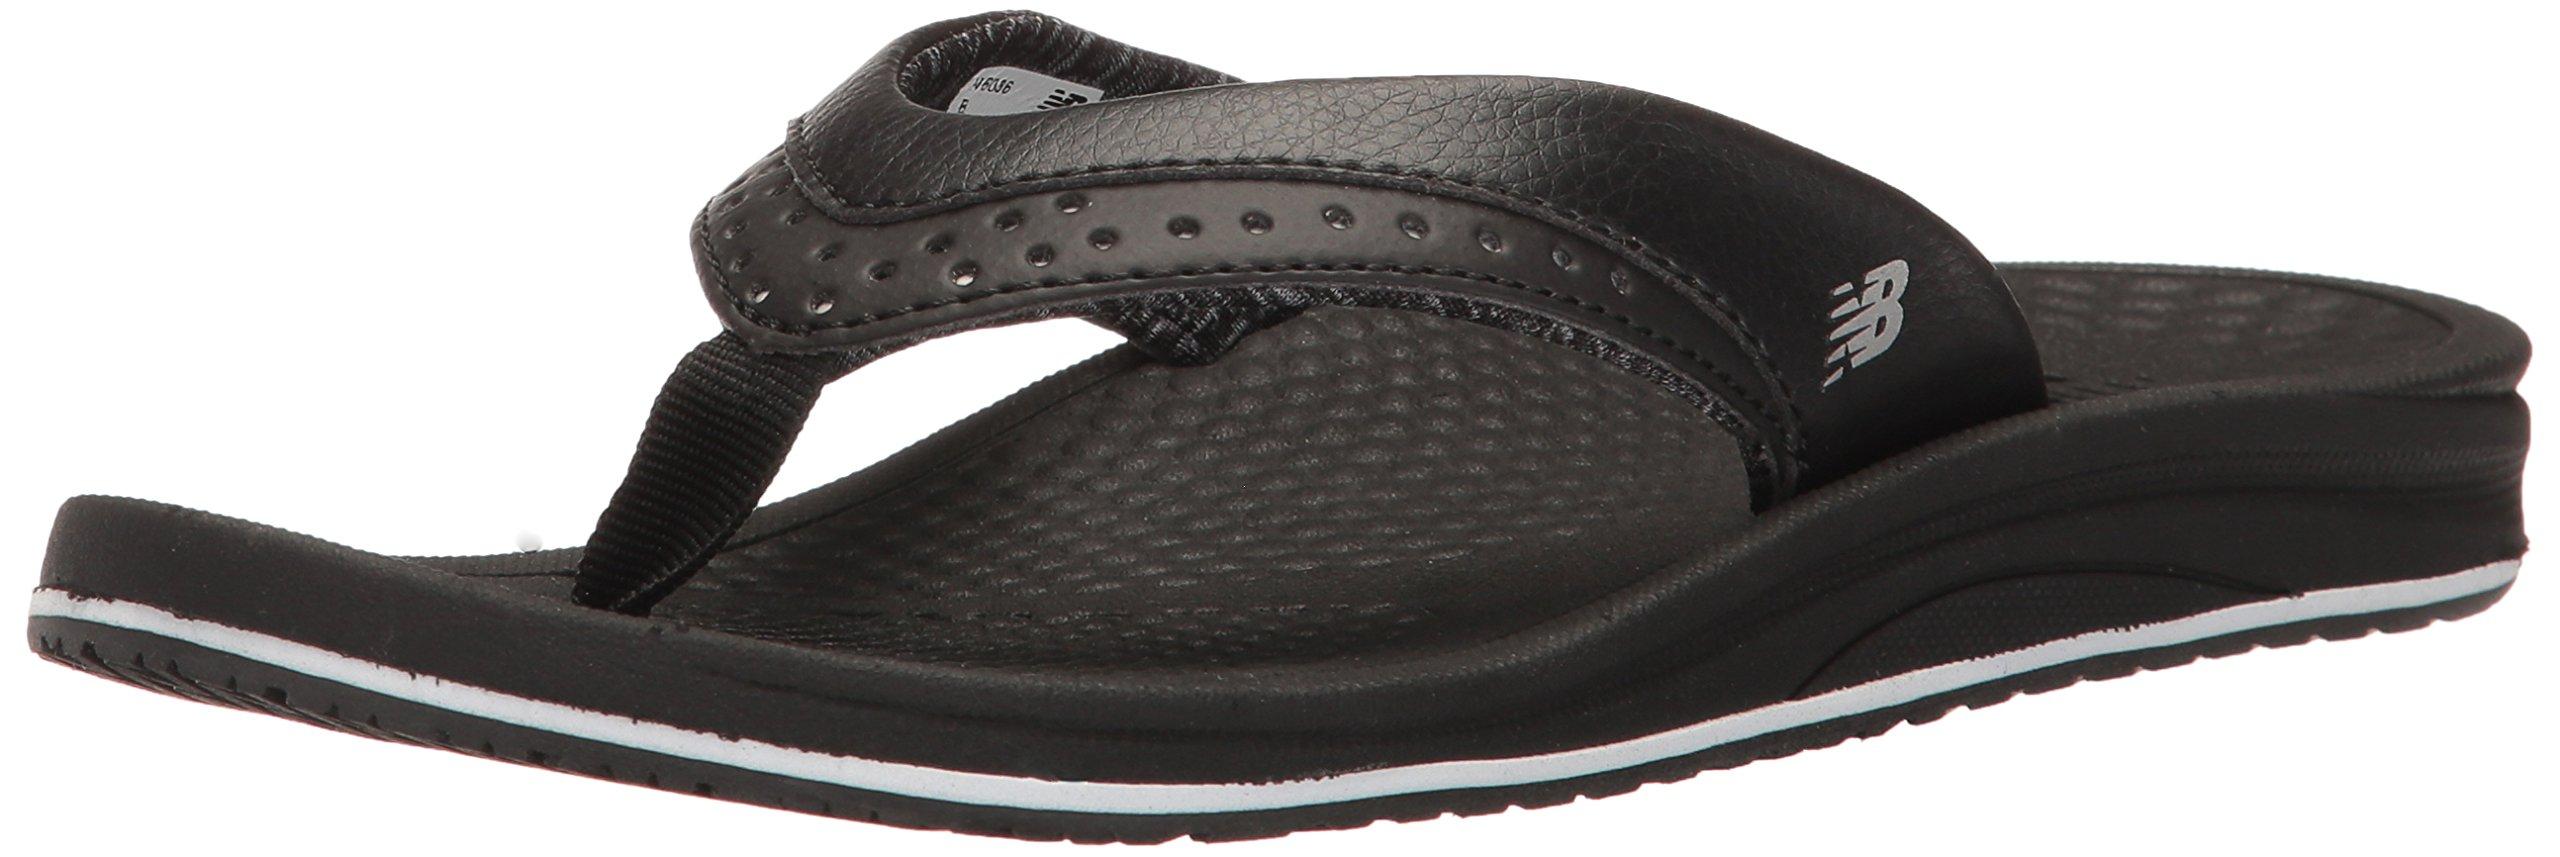 New Balance Women's Renew Thong Sandal, Black, 8 B US